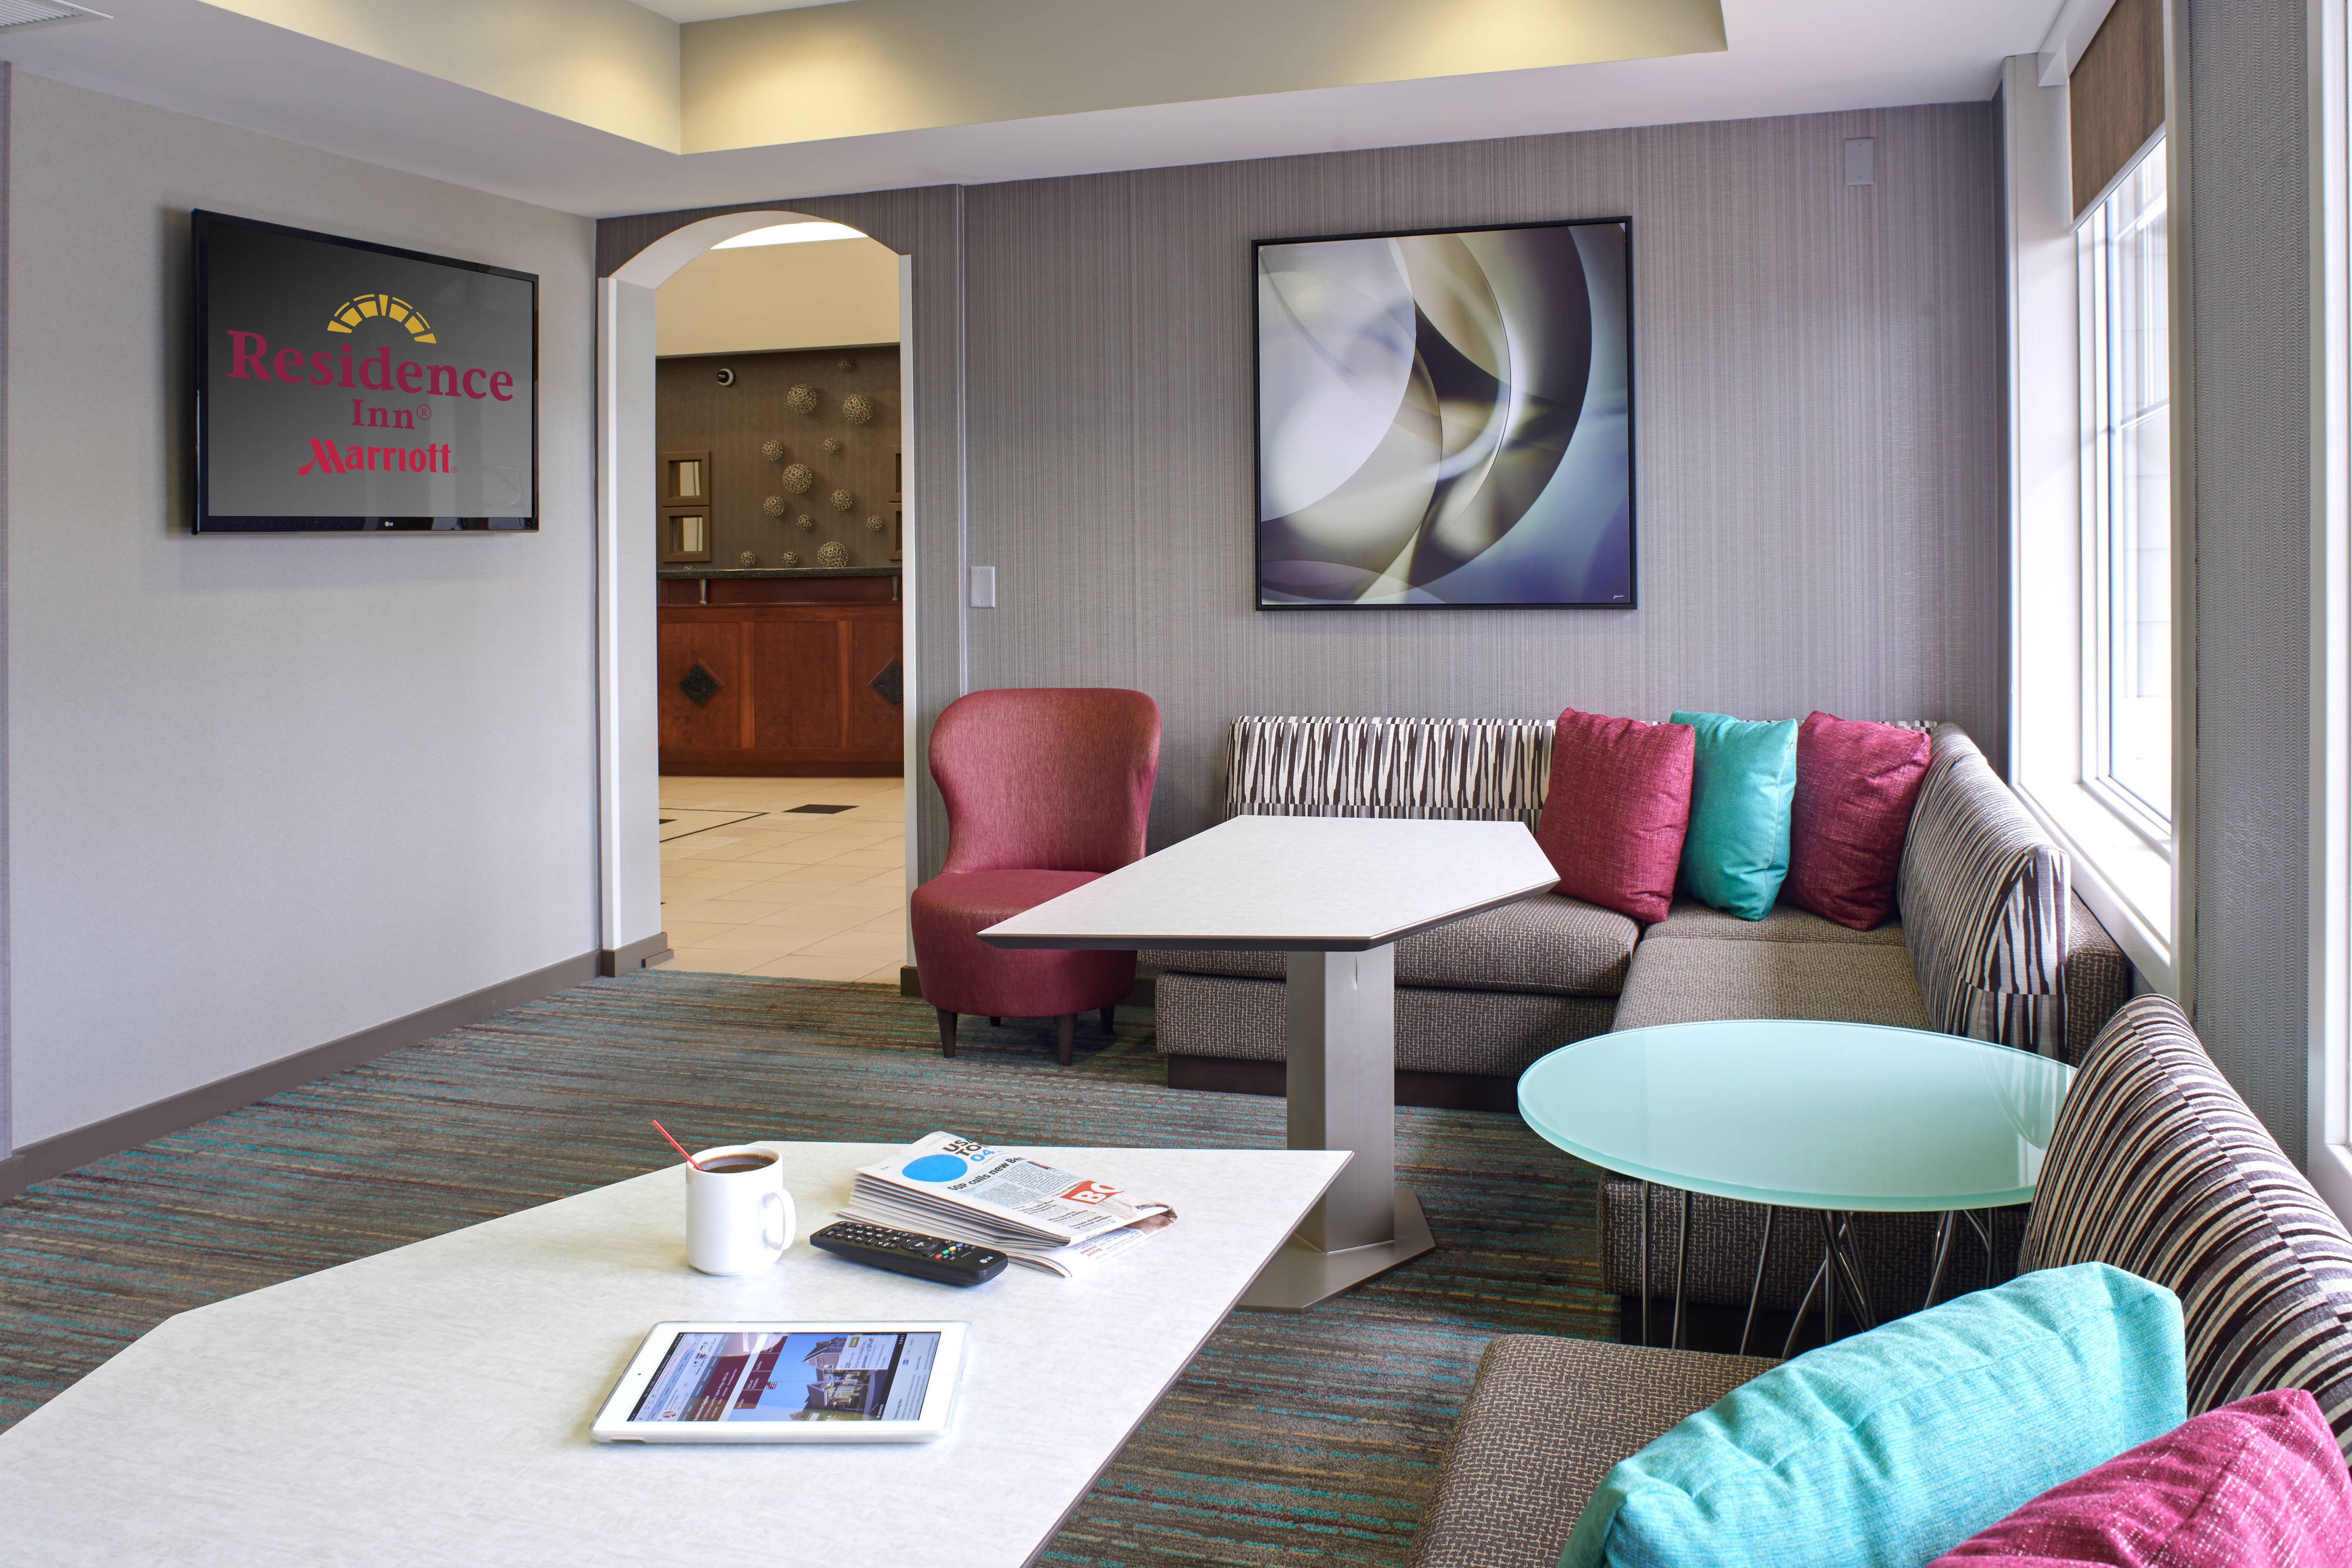 Saginaw hotel lobby seating area